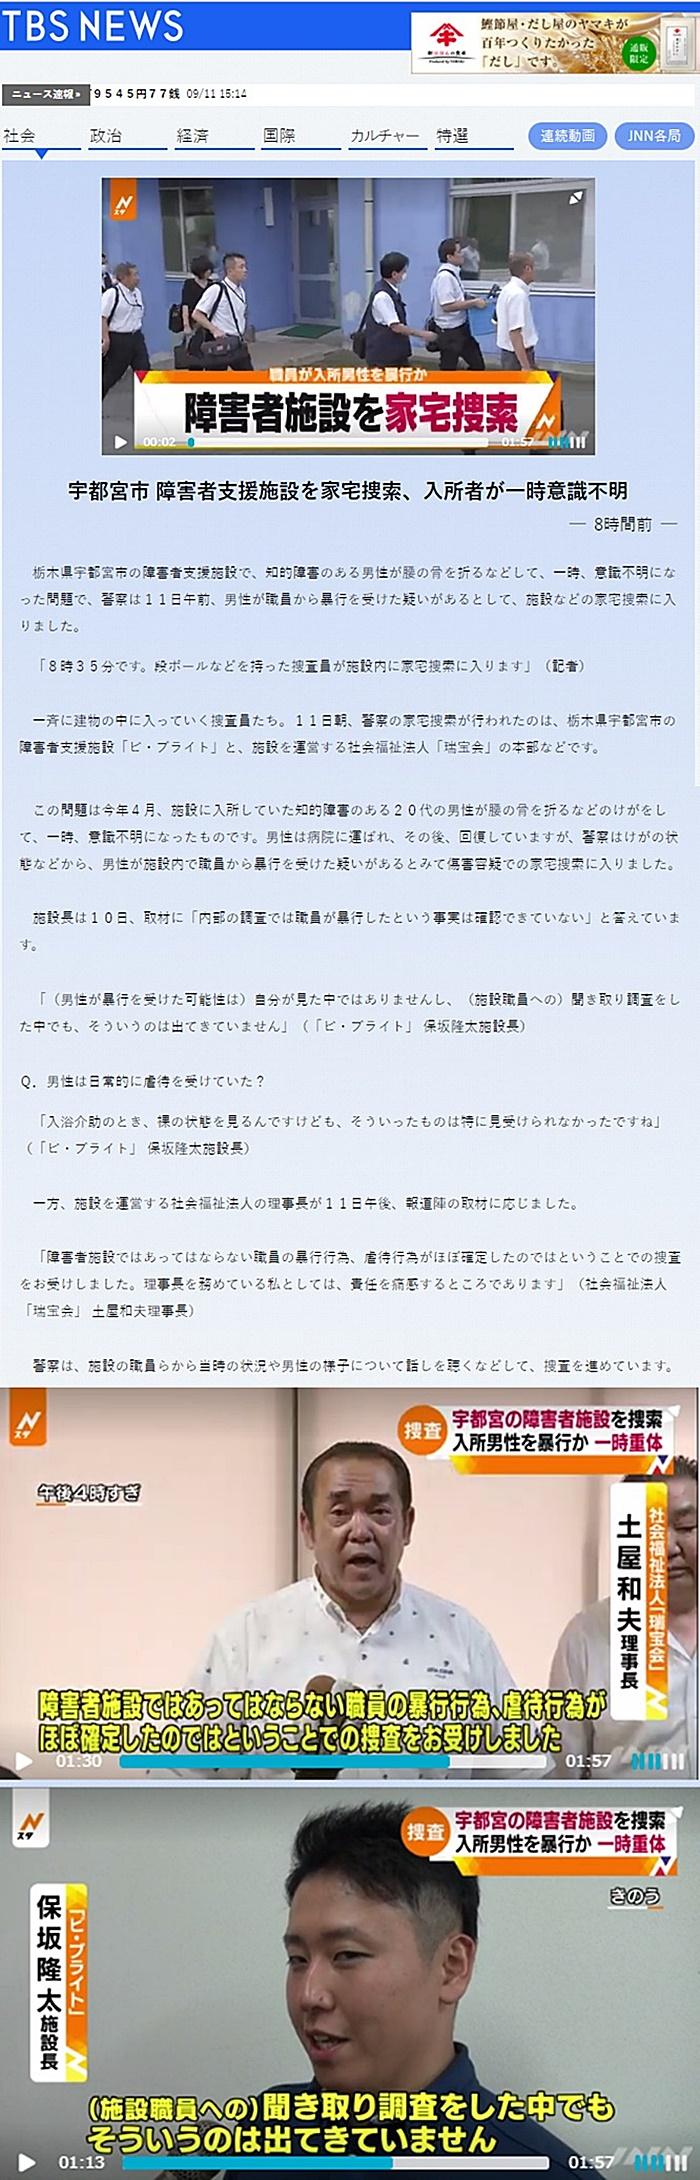 社会福祉法人瑞宝会 土屋和夫理事長 ビ・ブライト 3